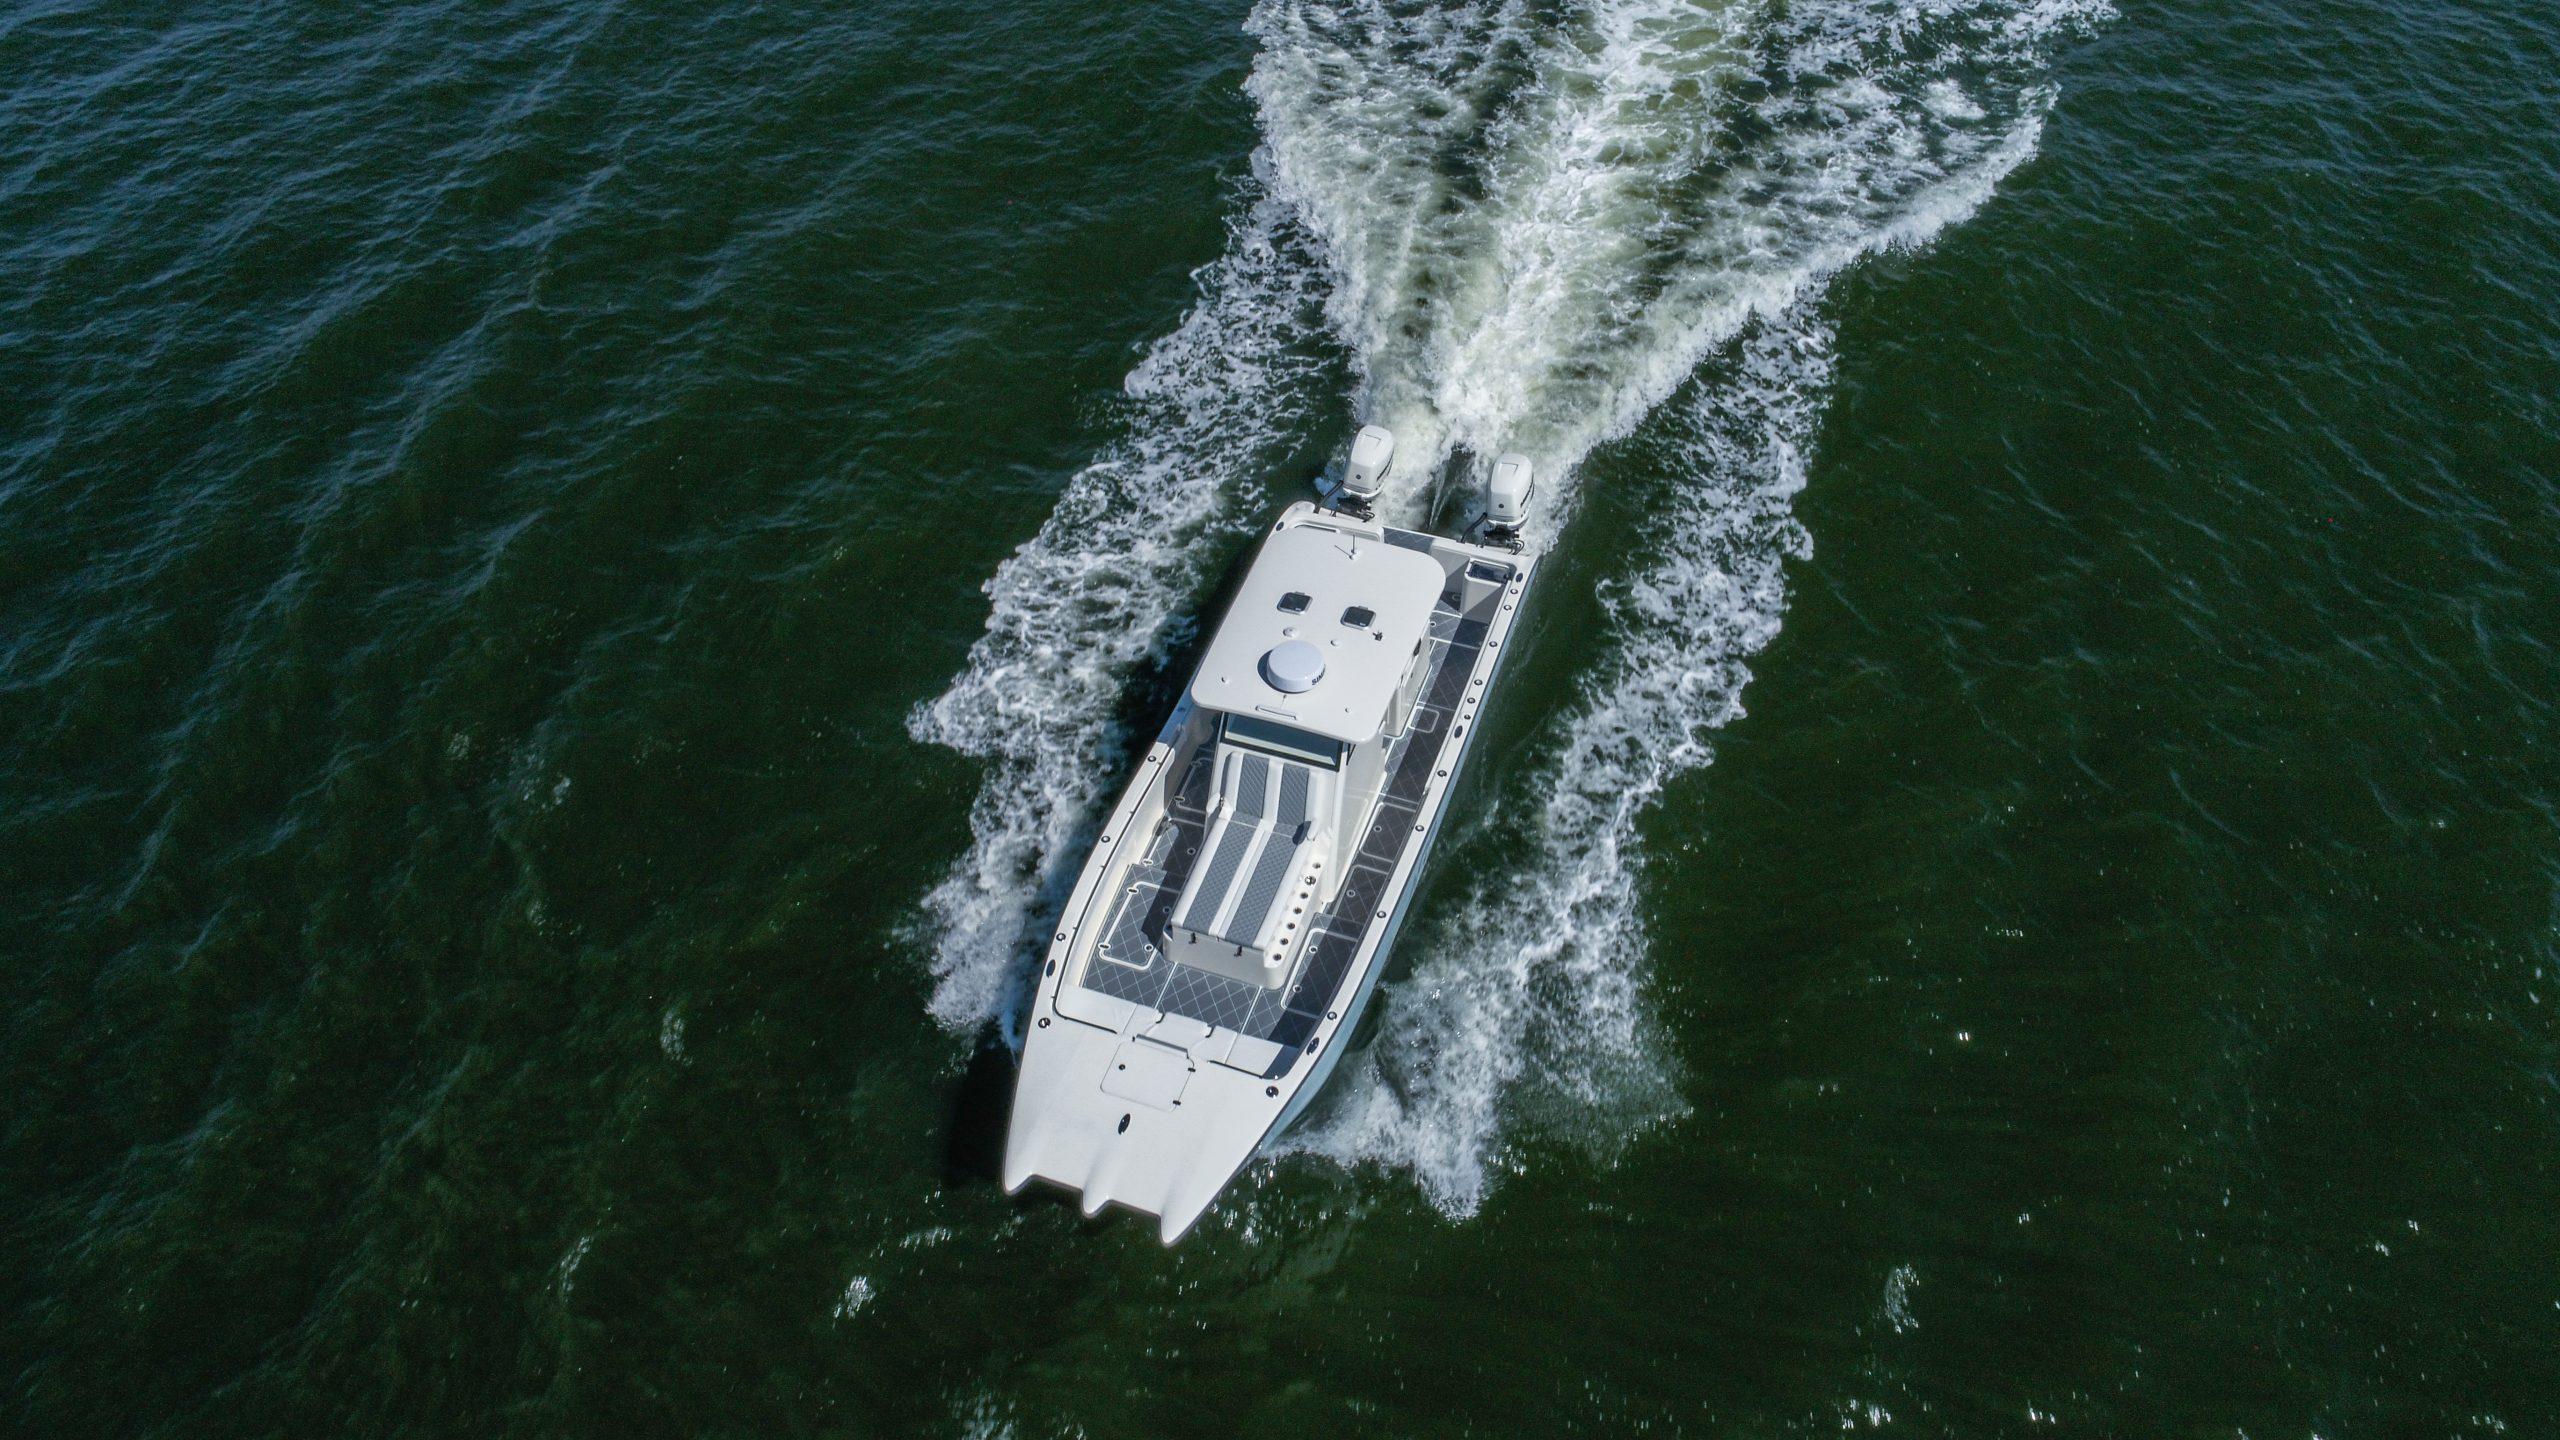 Overhead view of Foiling Catamaran